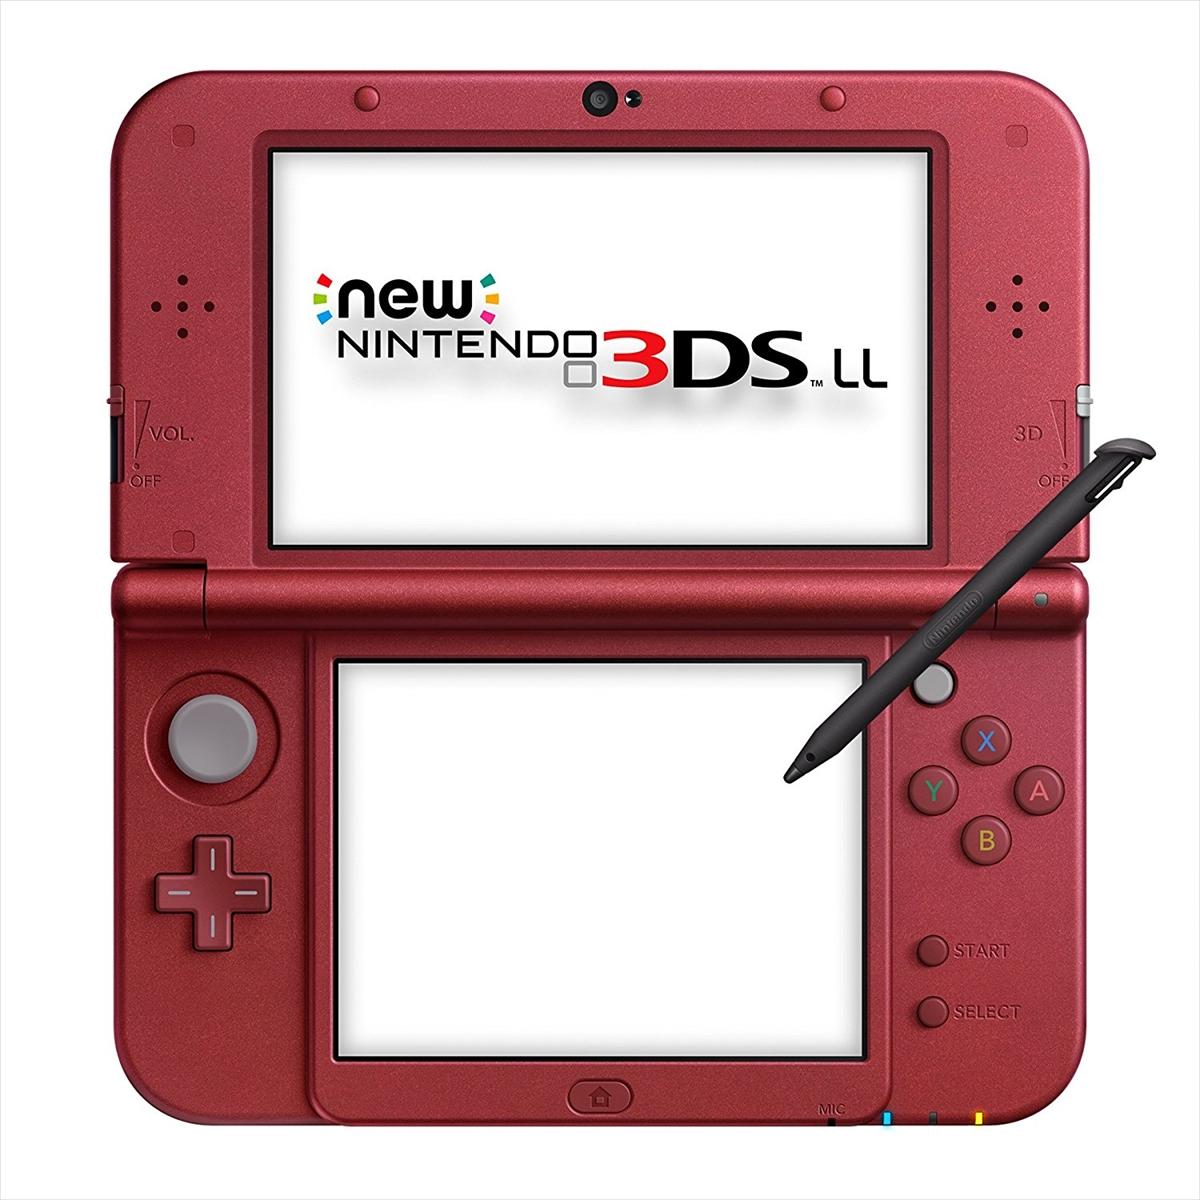 Newニンテンドー3DS LL 本体 メタリックレッド 本体 完品 外箱付き ニンテンドー 任天堂 Nintendo 中古 4902370529883 送料無料 【中古】